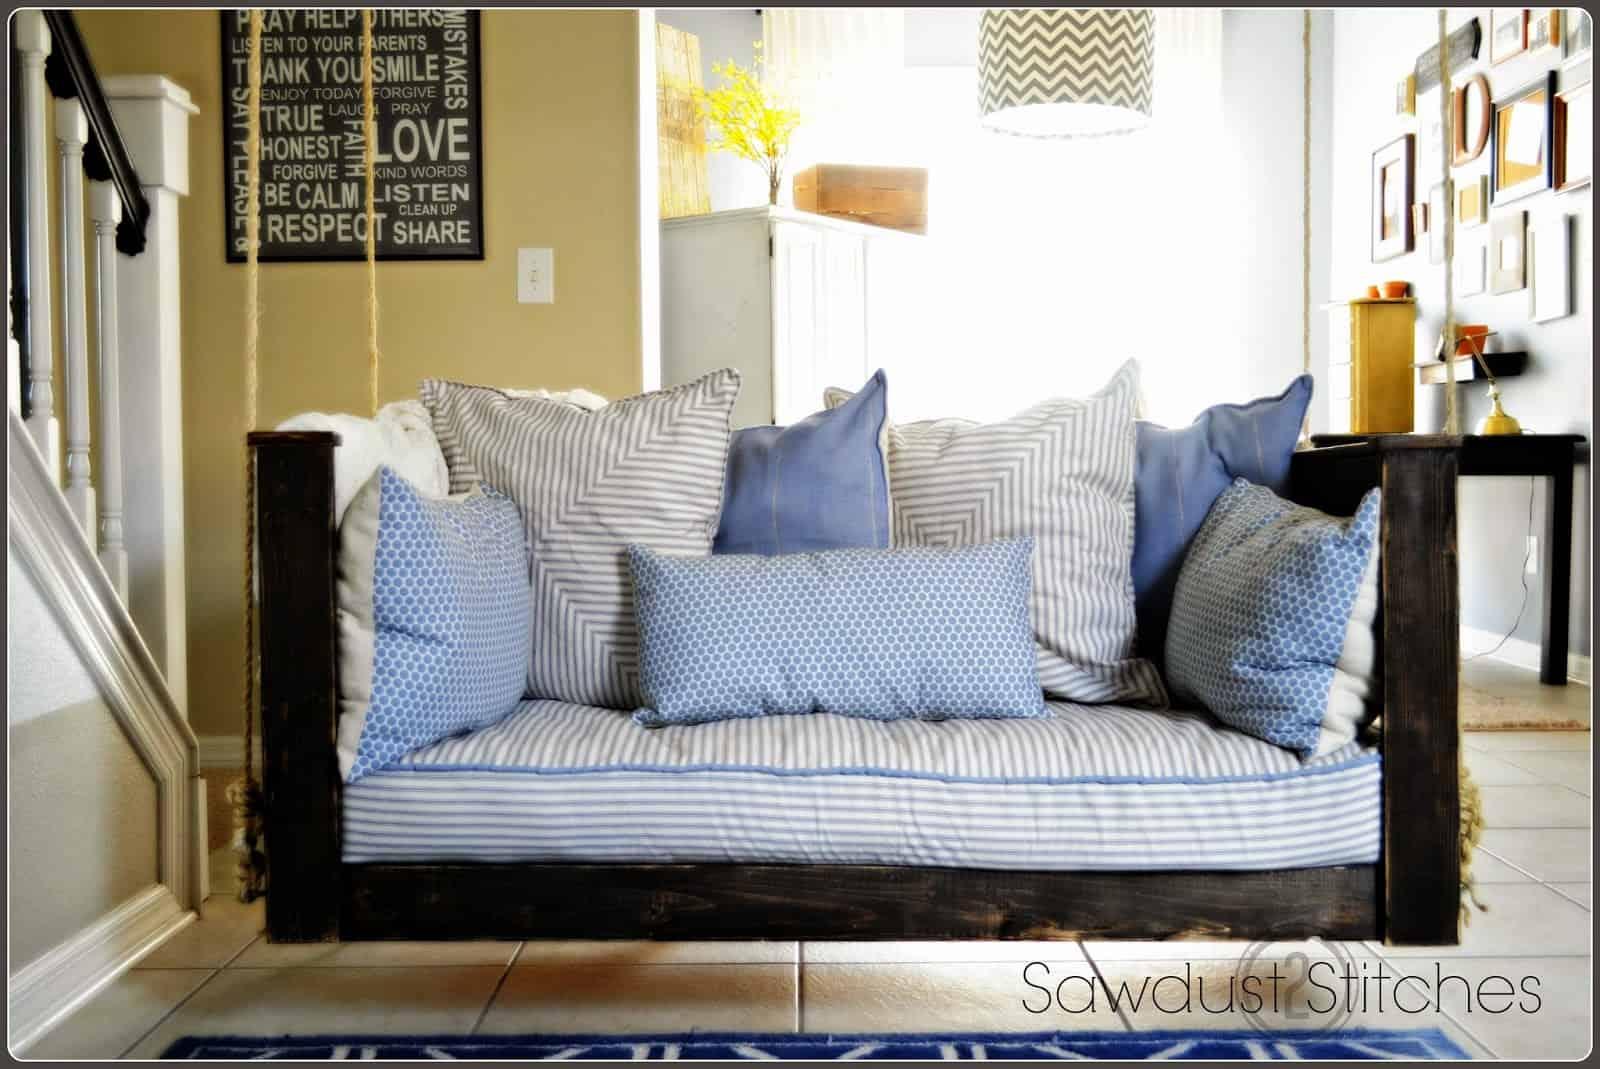 Wood and crib mattress porch swing